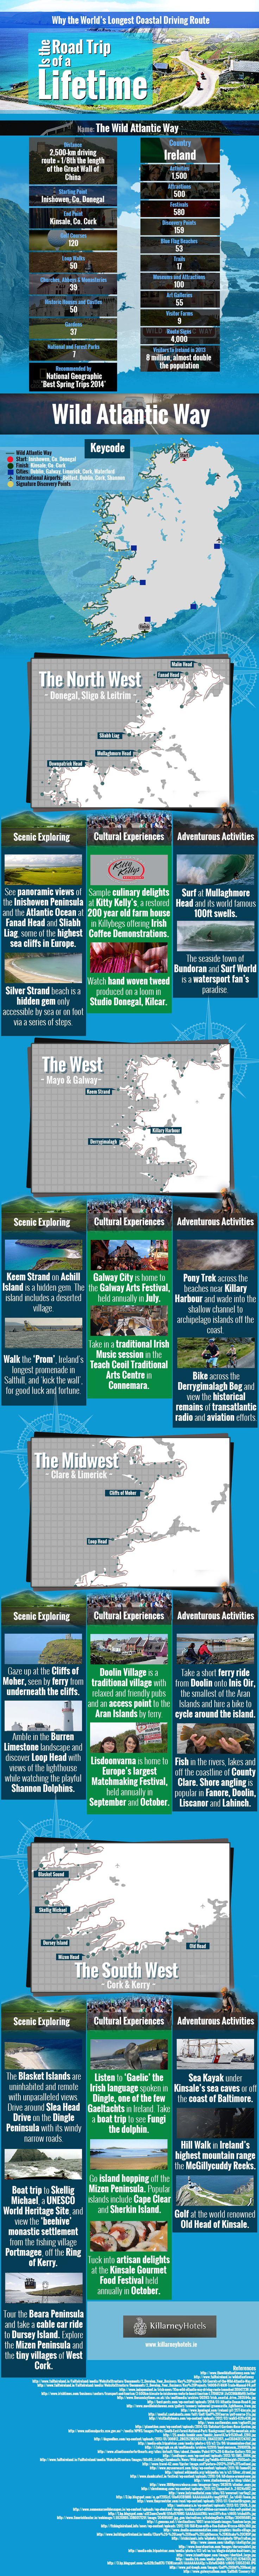 The Wild Atlantic Way - the roadtrip of a lifetime!